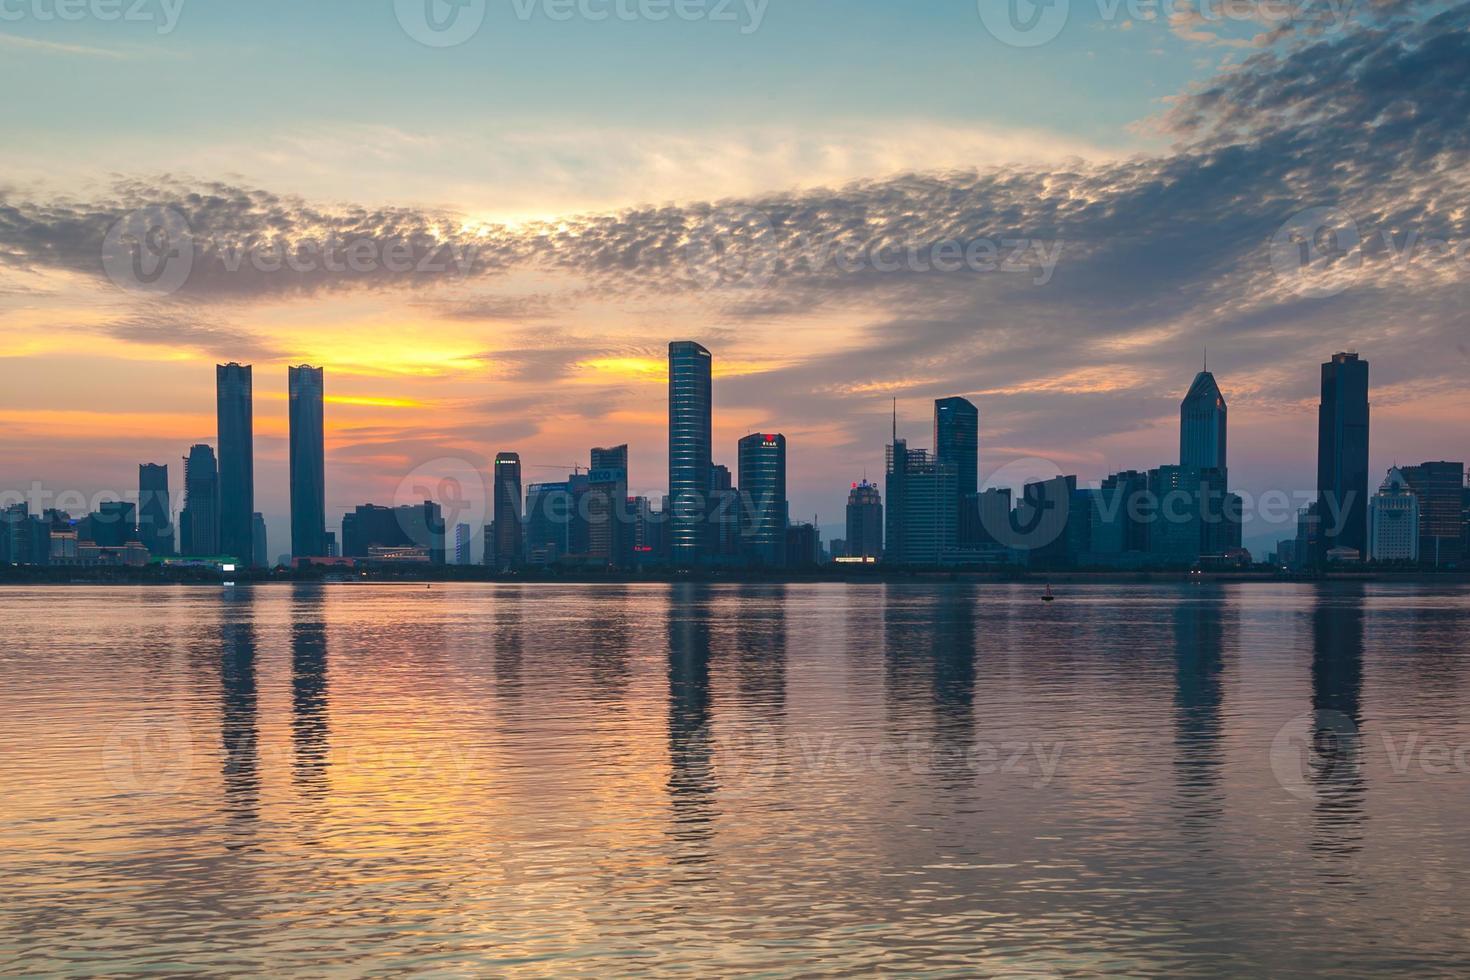 Sunset illuminated city photo